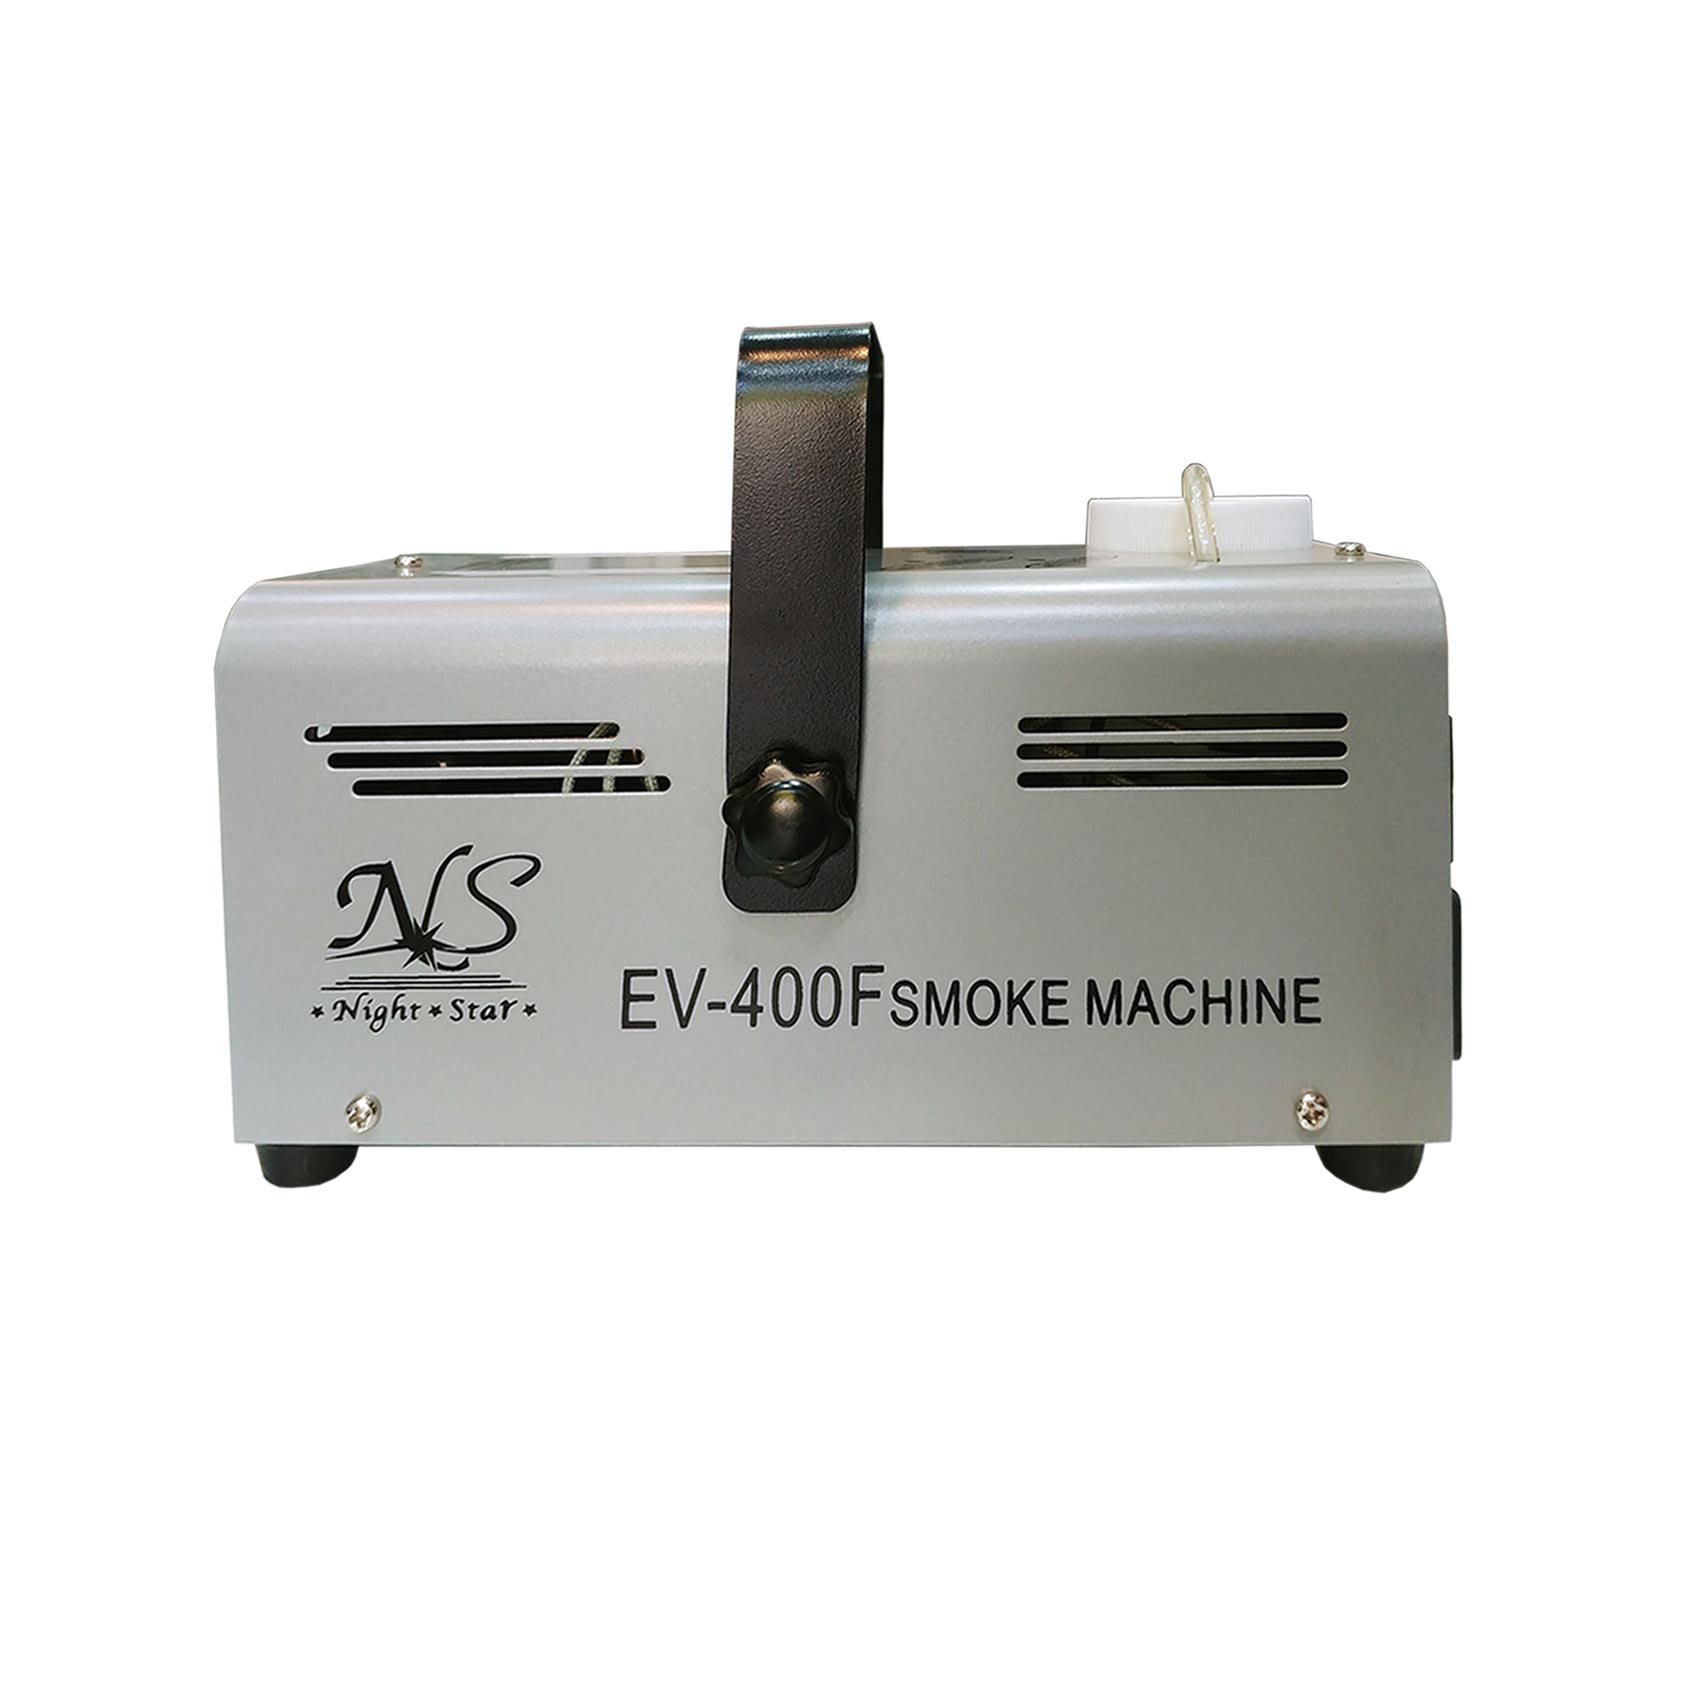 EV-400F-smoke